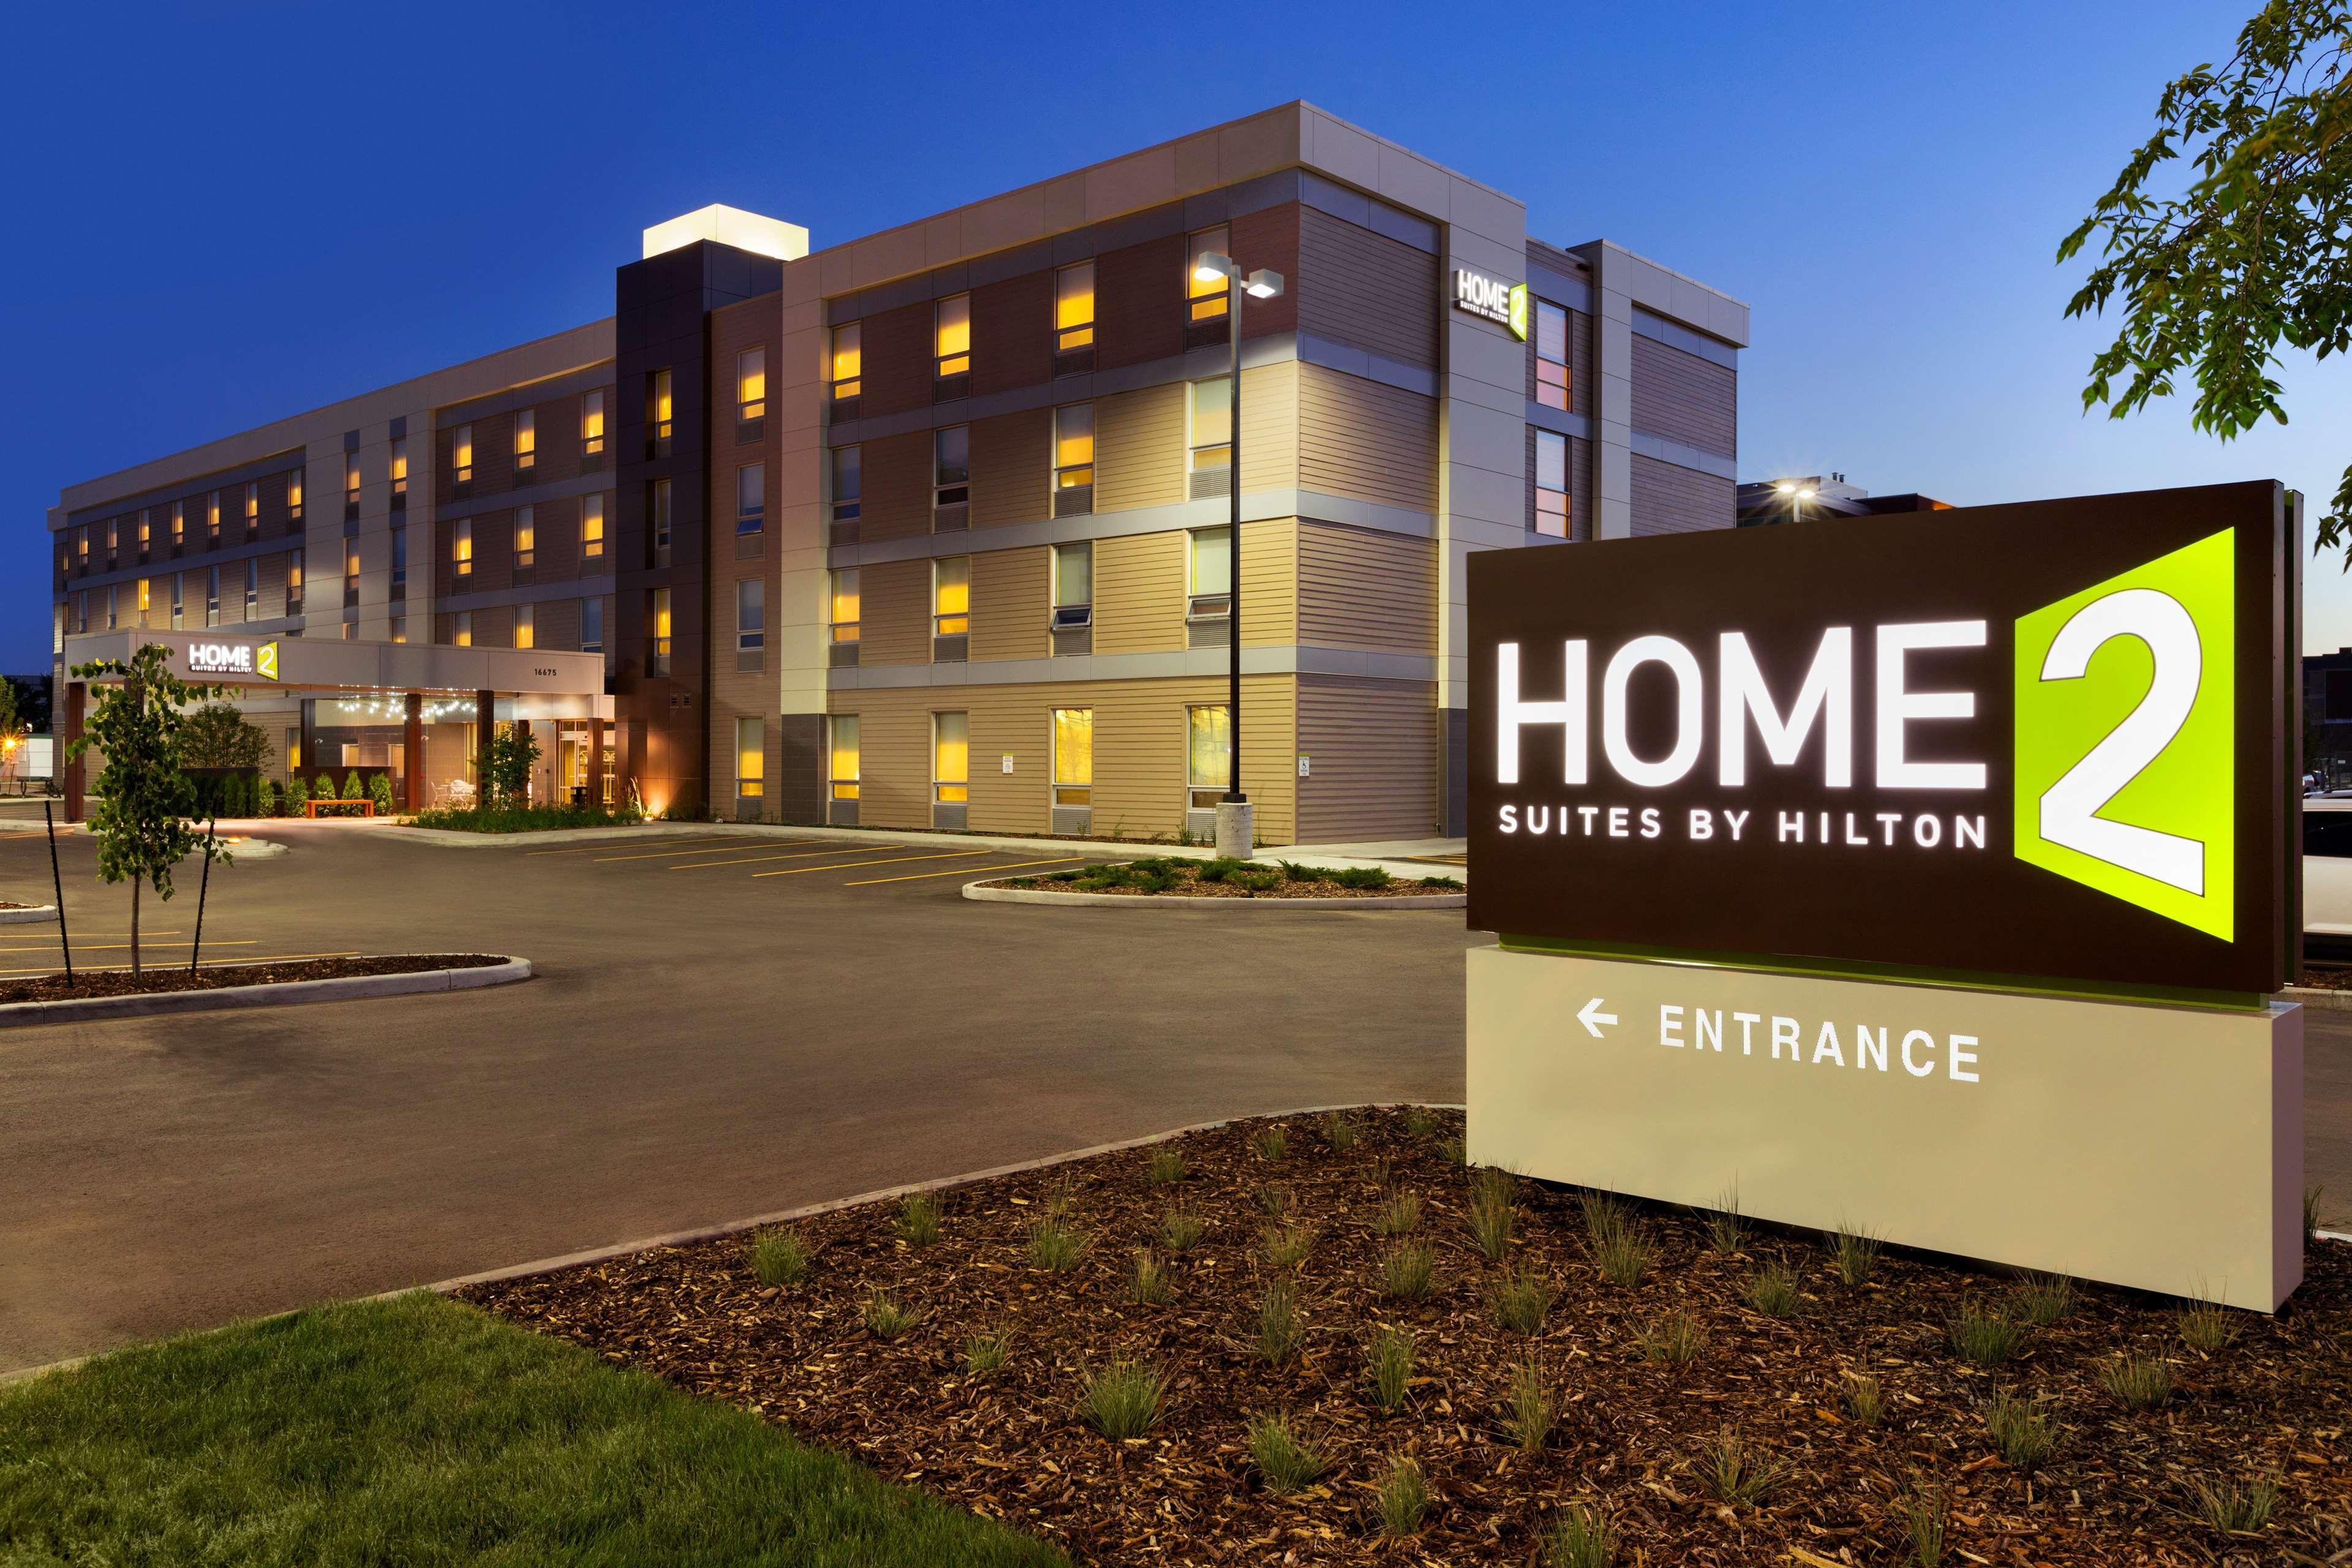 Home2 Suites by Hilton West Edmonton, Alberta, Canada in Edmonton: Exterior